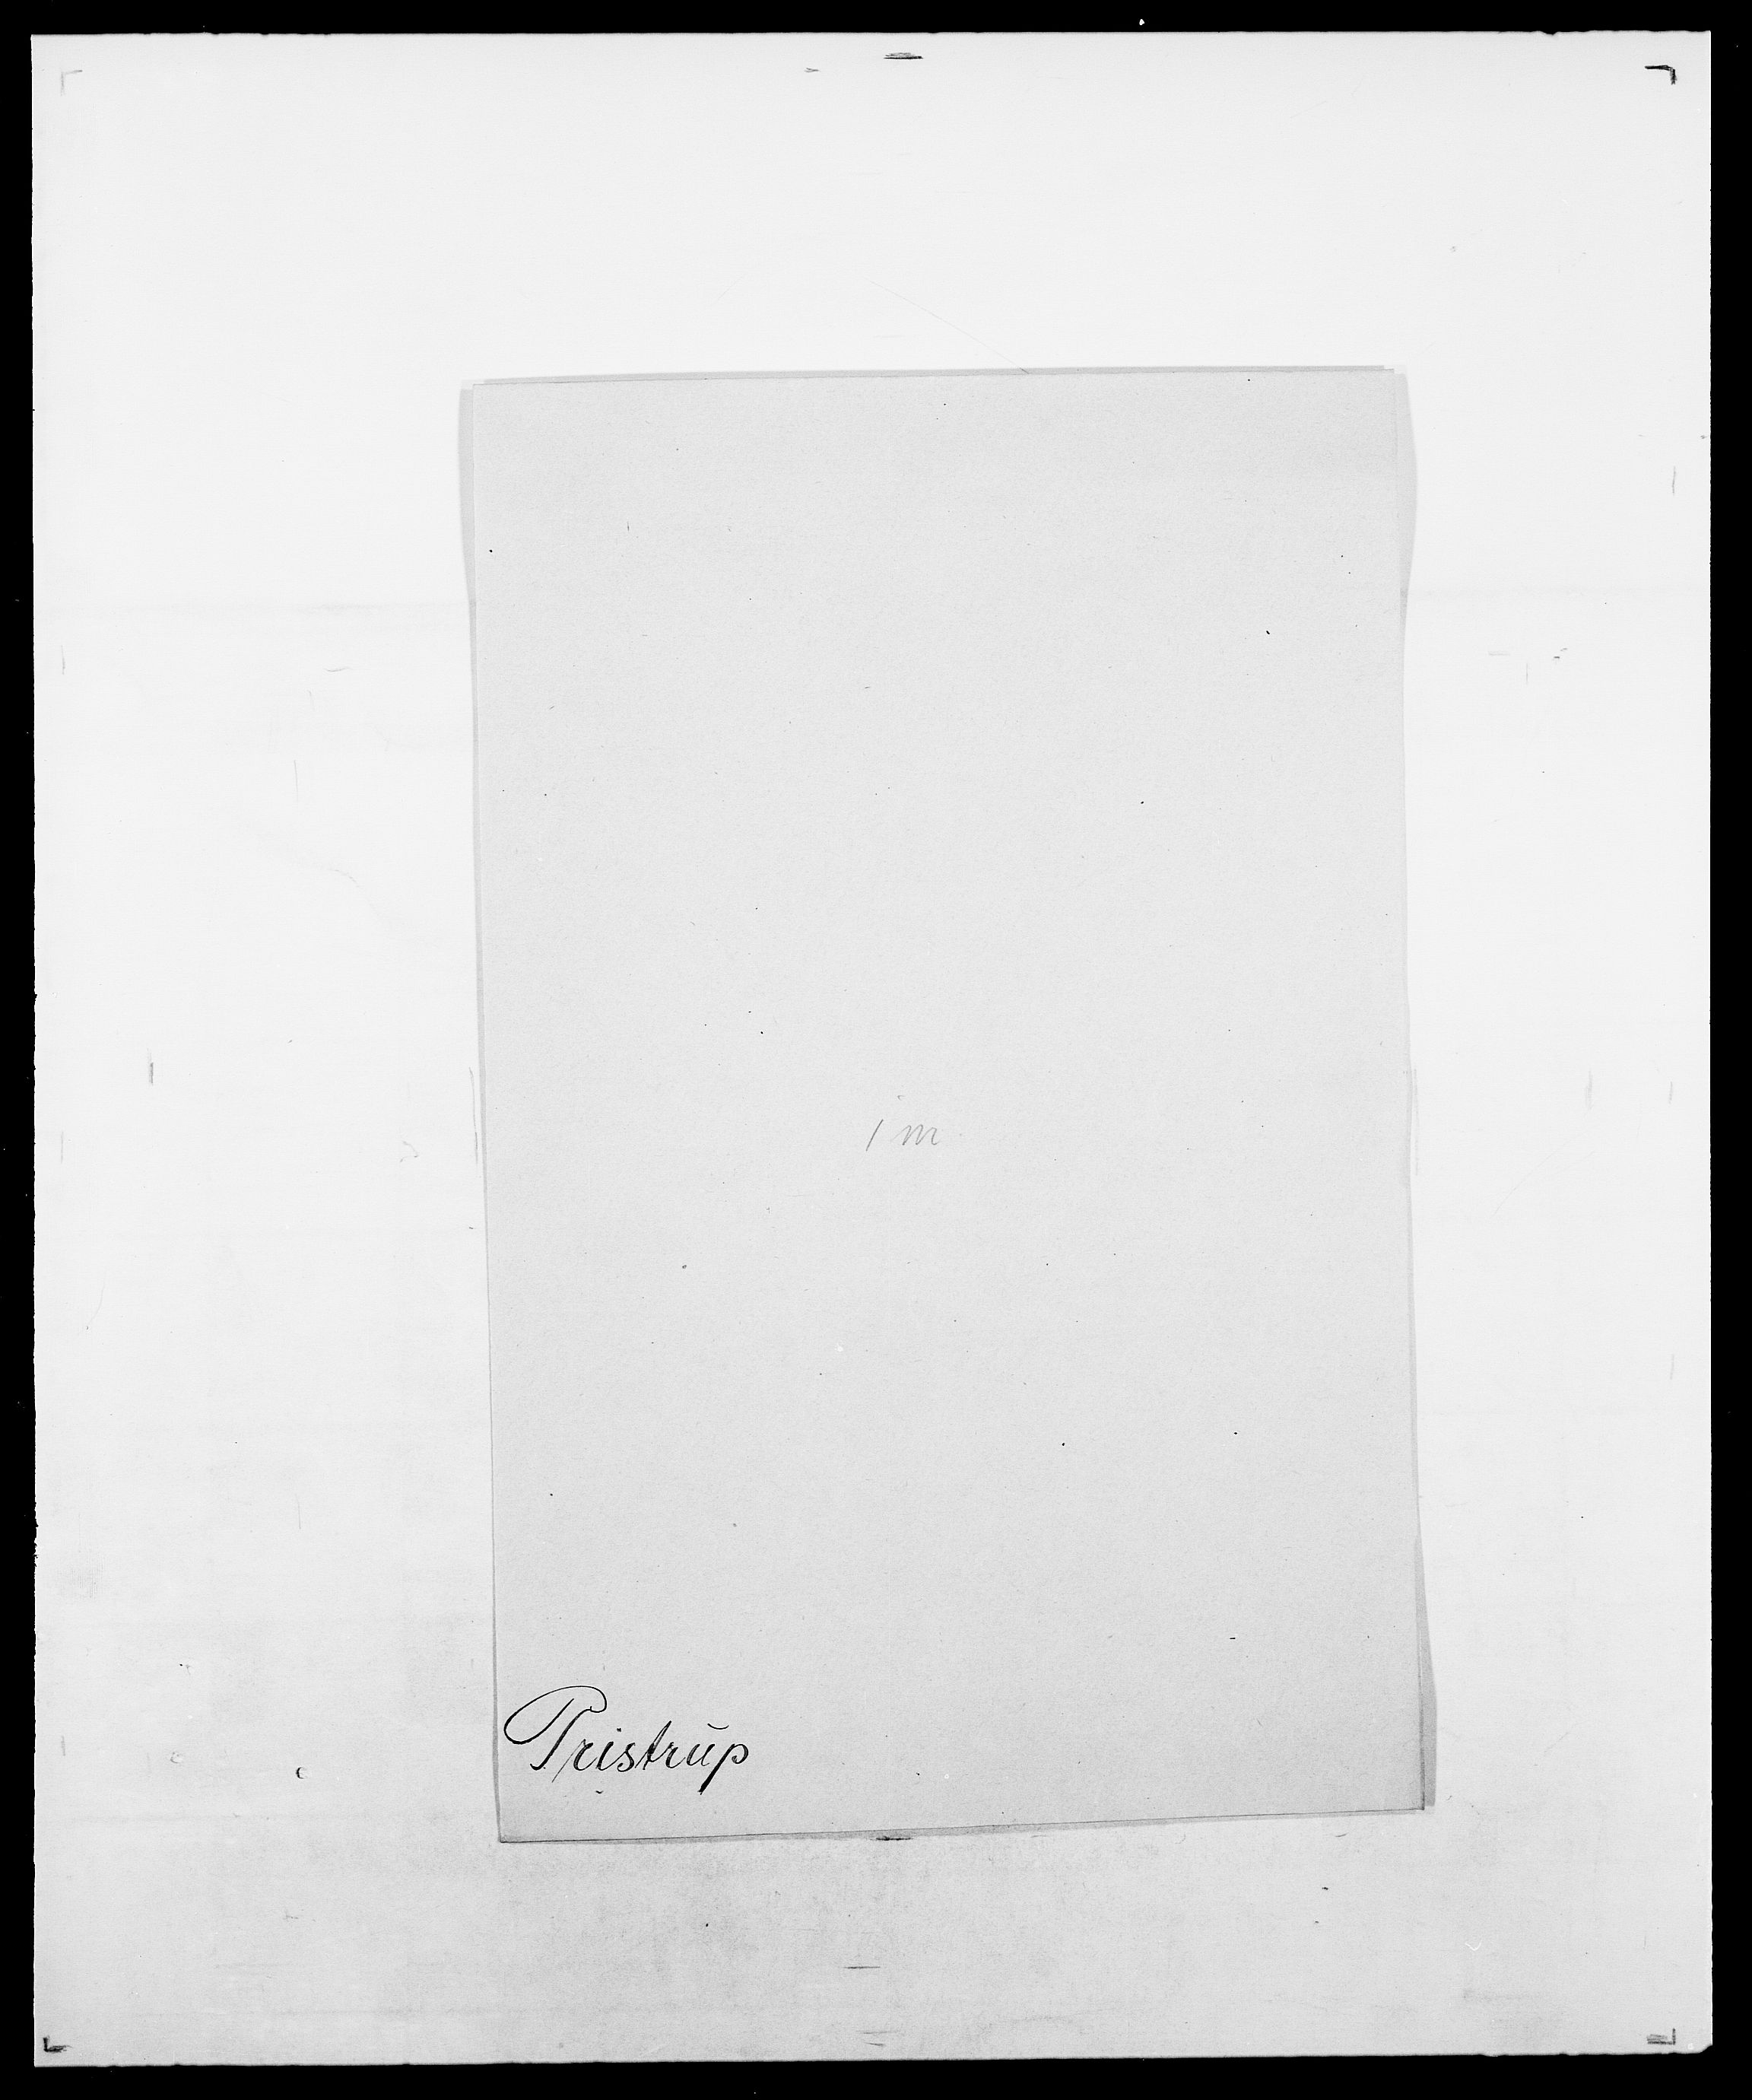 SAO, Delgobe, Charles Antoine - samling, D/Da/L0031: de Place - Raaum, s. 357